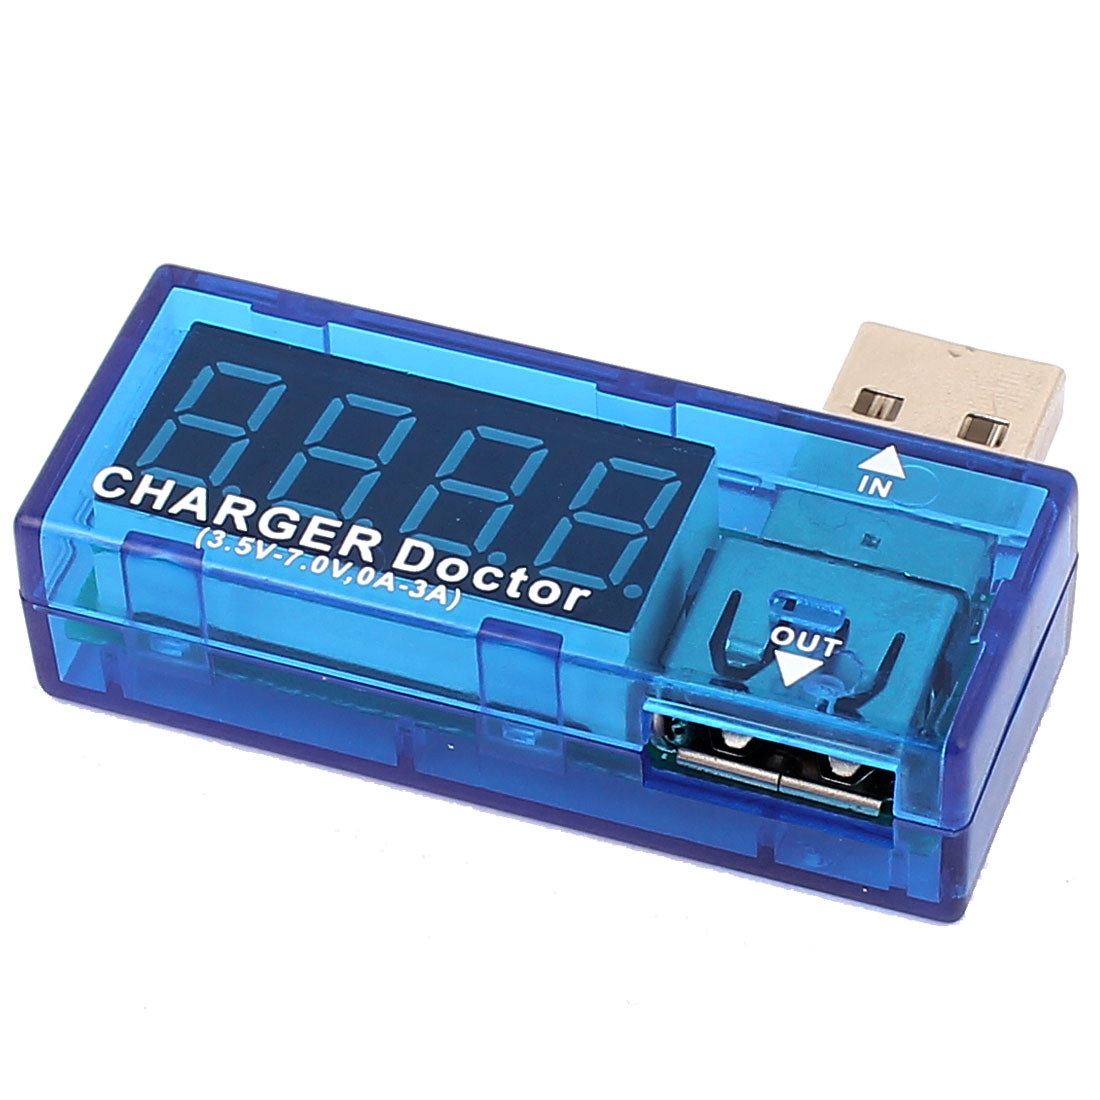 Portable USB Power Tester Detector Charger Voltage Current Meter Blue